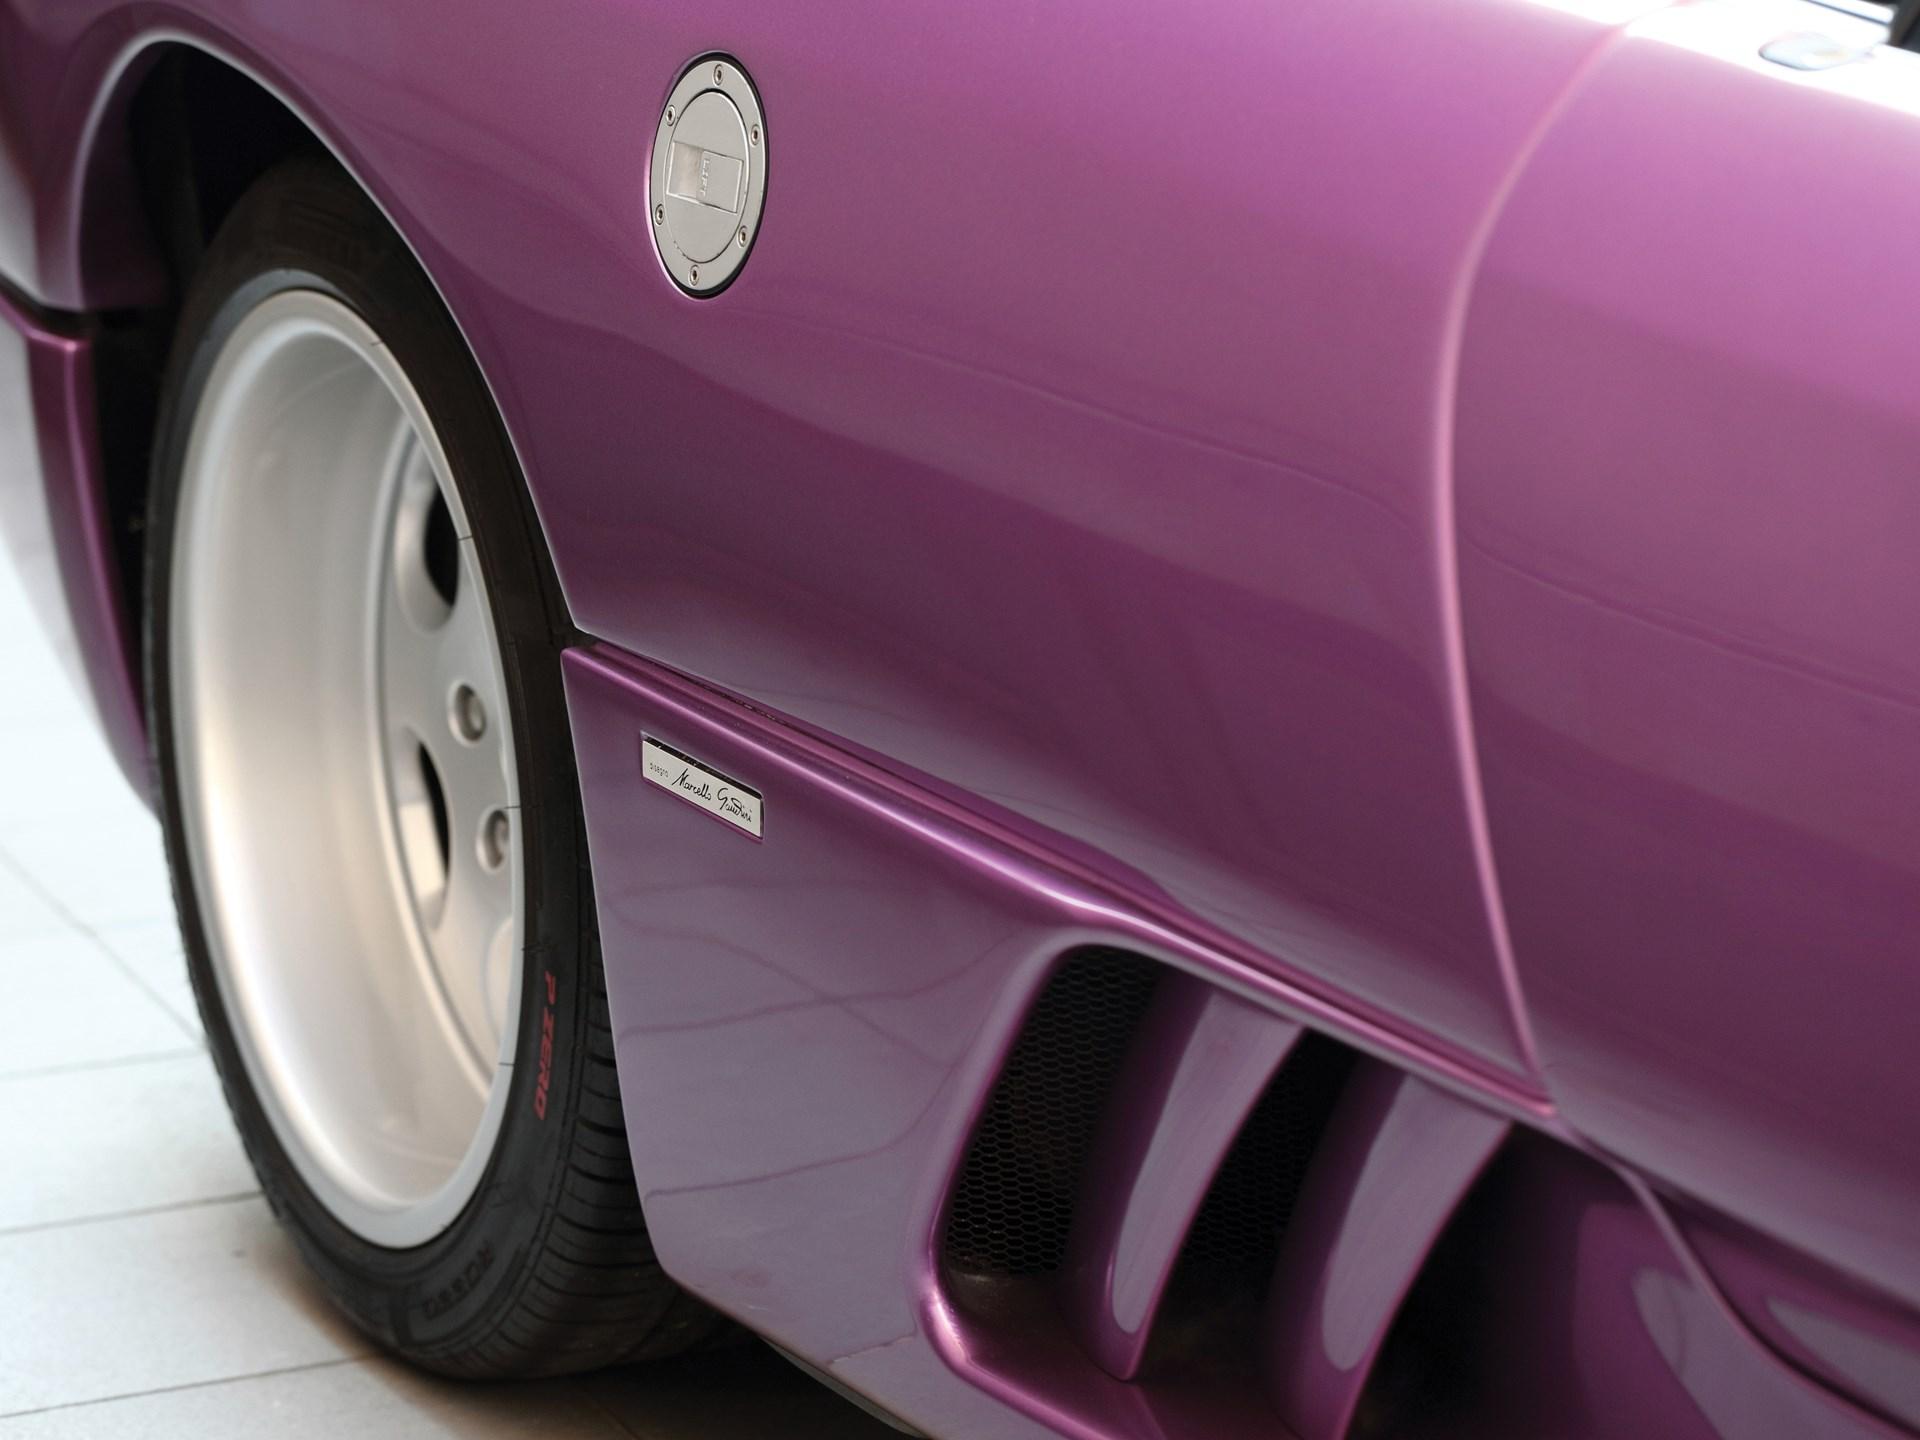 RM Sotheby's - 1994 Lamborghini Diablo SE30 | Villa Erba 2017 on purple porsche 911, purple nissan gt-r, purple hennessey venom gt, purple bmw m3, purple pagani huayra, purple fiat 500, purple toyota corolla, purple ferrari, purple volkswagen beetle, el diablo, purple lotus elise, purple rolls royce, lamborgini diablo, purple saleen s7, purple audi tt, purple mclaren p1, purple pagani zonda, purple mitsubishi eclipse, purple roadster, purple laferrari,